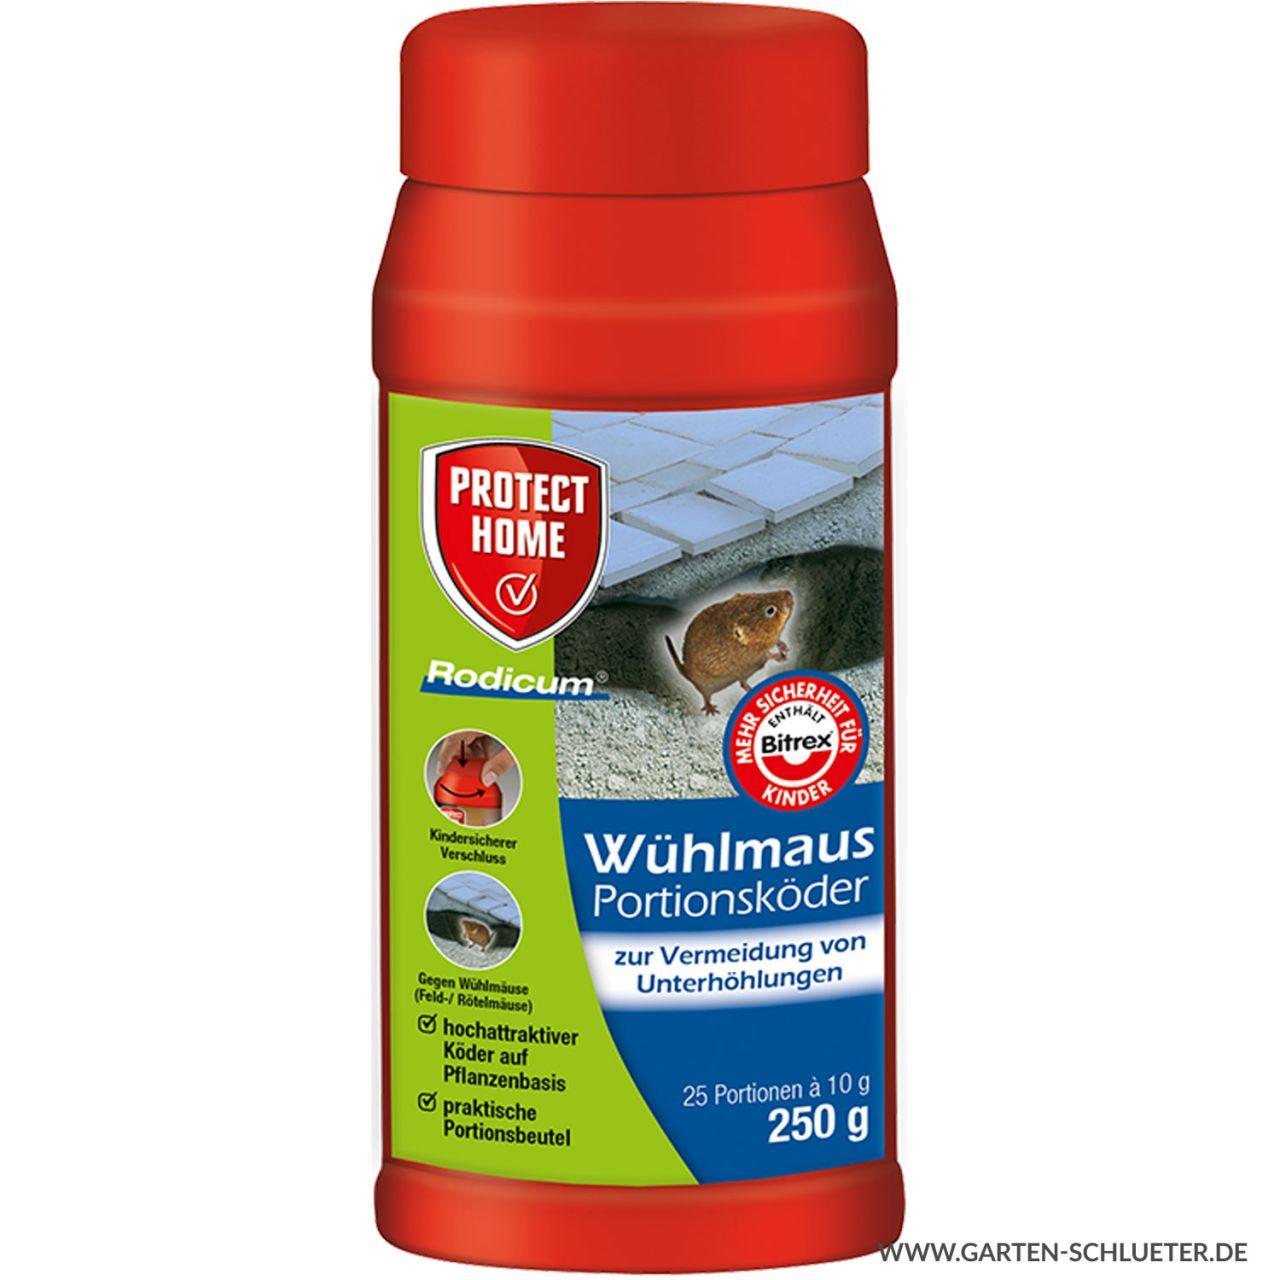 Protect Home Wühlmaus Portionsköder Rodicum 250 g